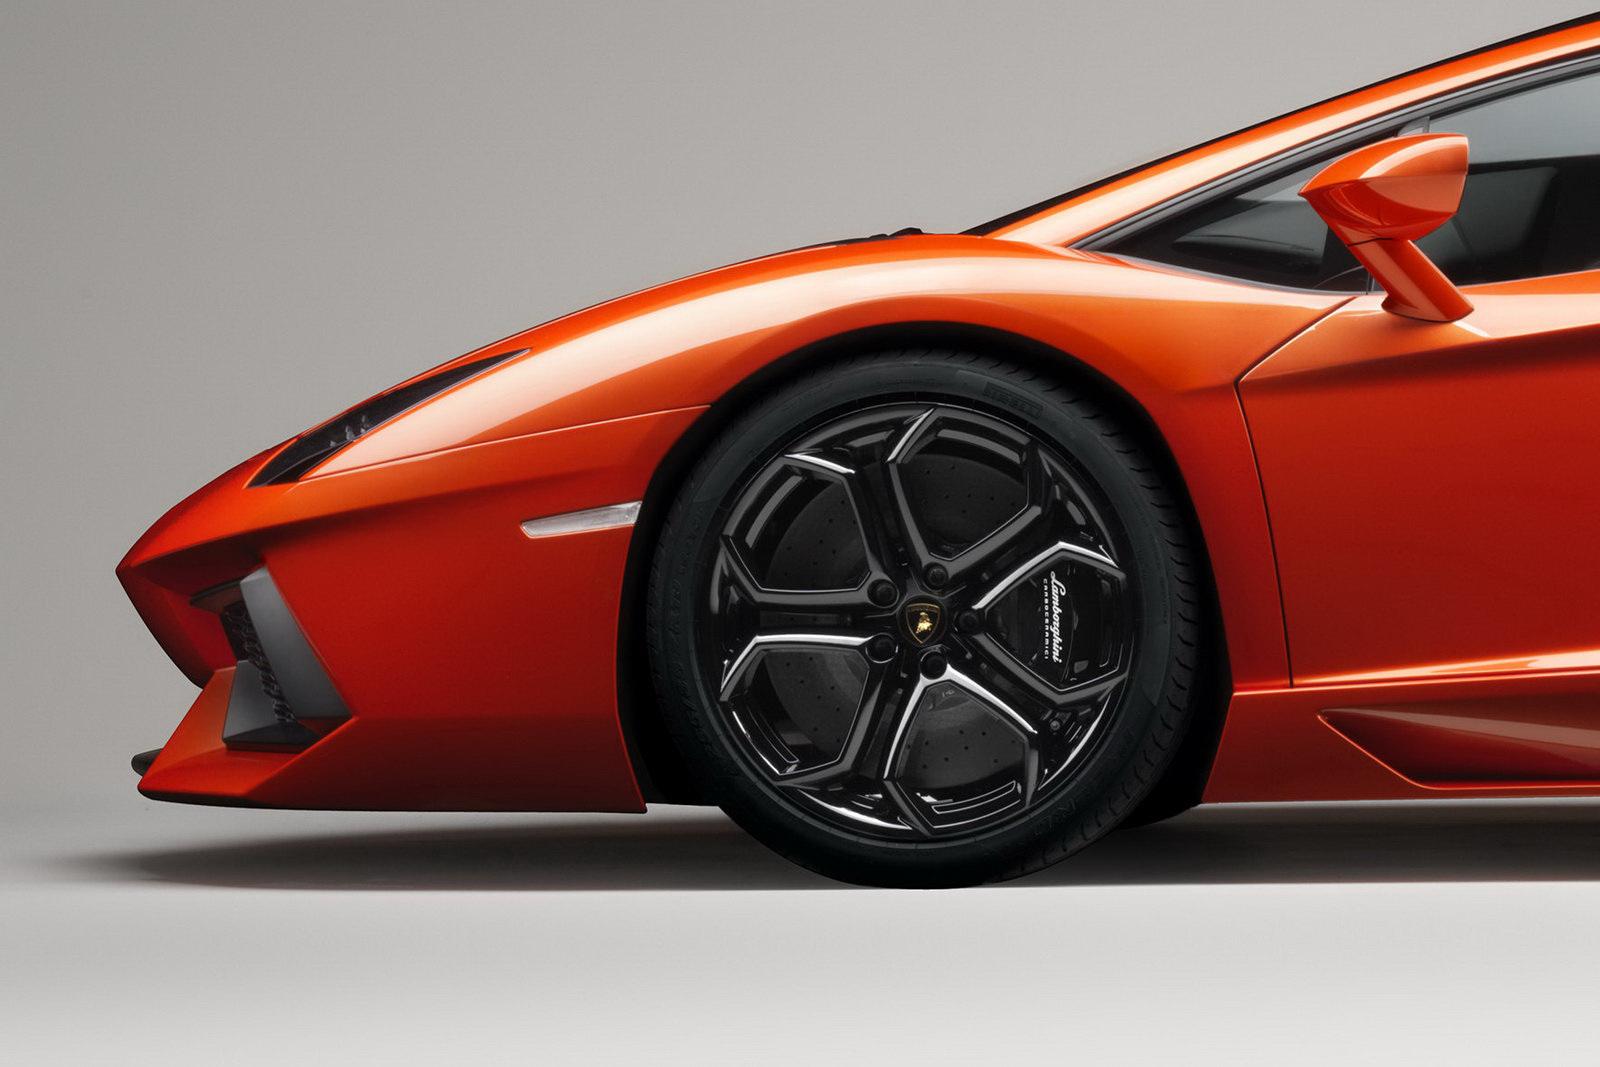 Luxury Lamborghini Cars: Lamborghini Aventador Lp700-4